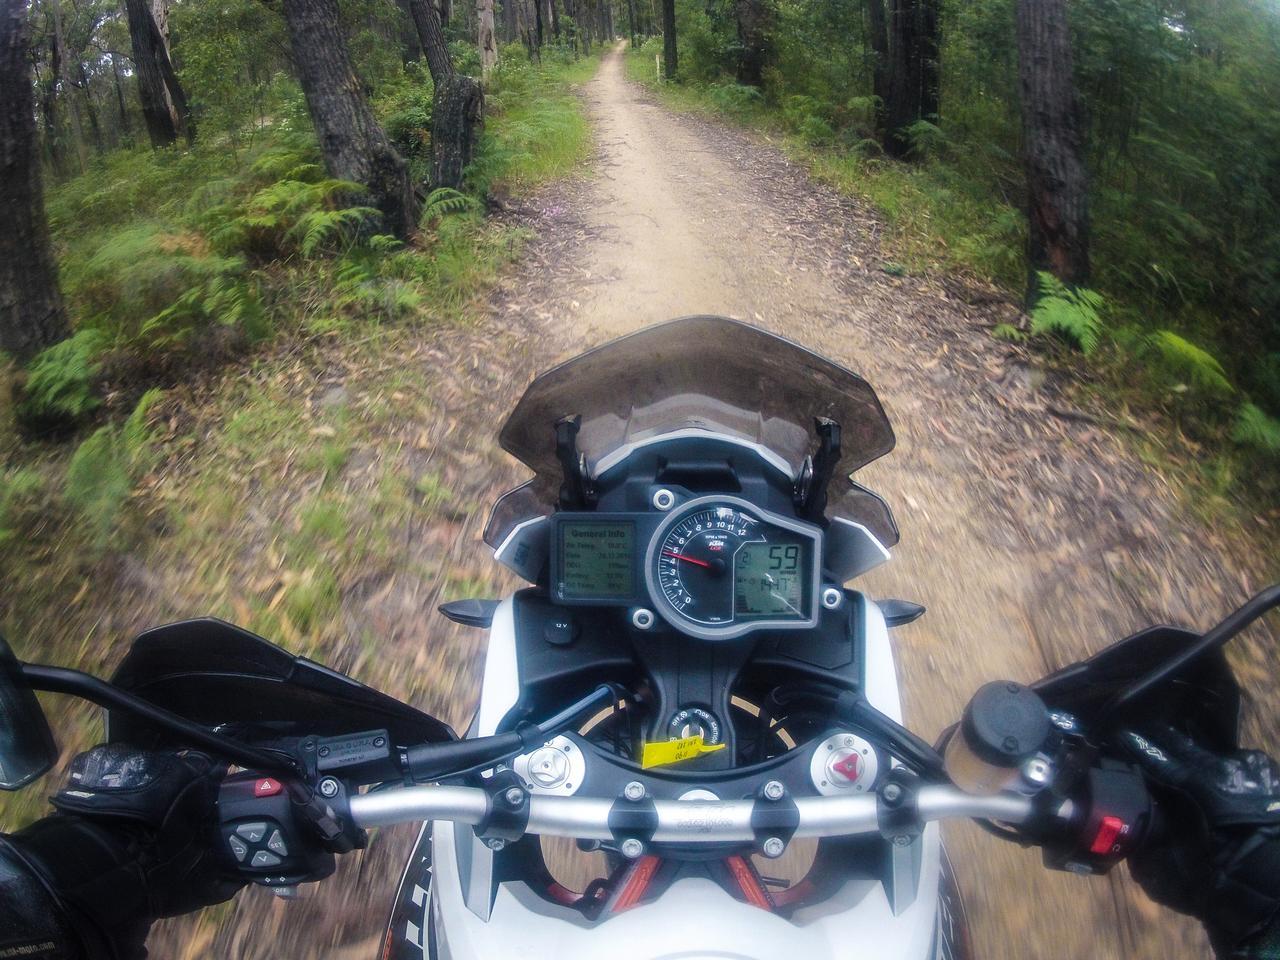 KTM Adventure 1190 R: a true dirt superbike (Photo: Gizmag/Loz Blain)